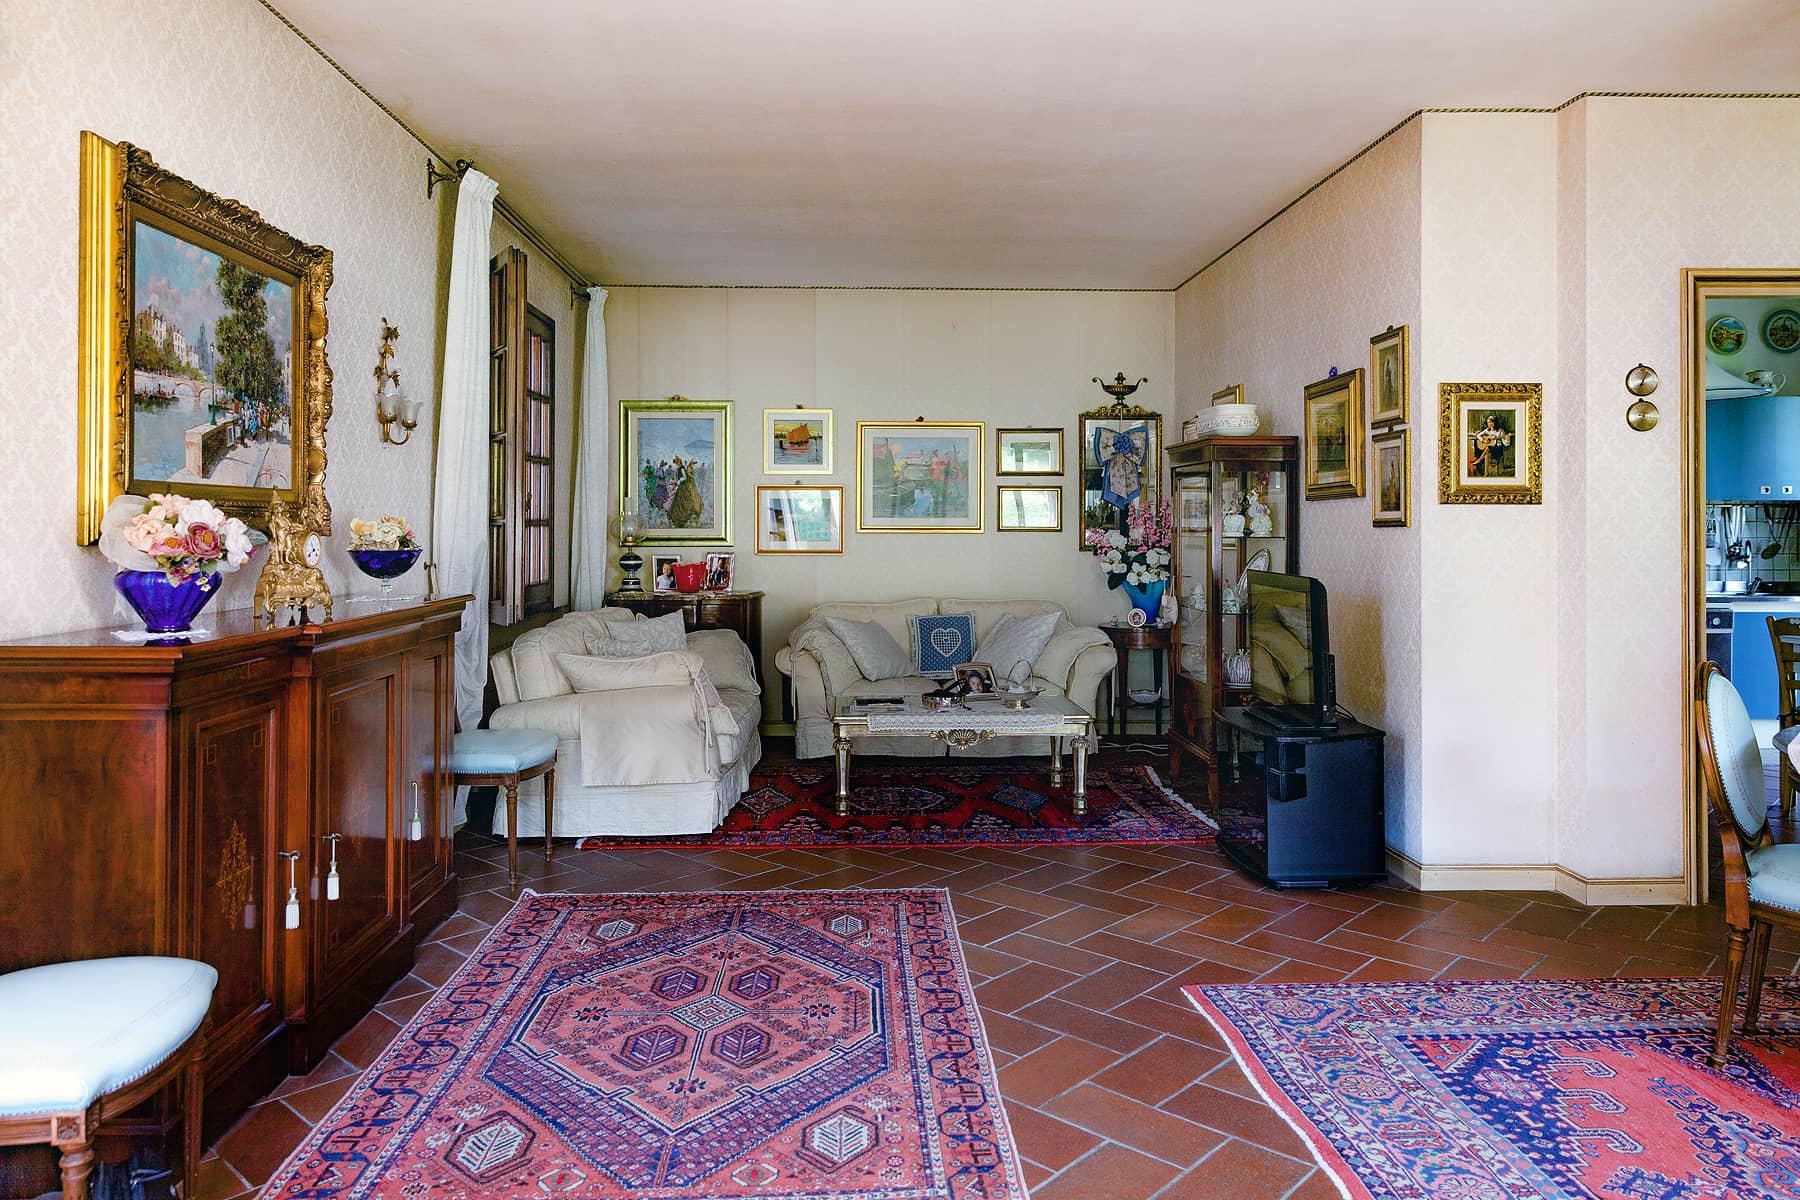 Villa in Vendita a Carbonera: 5 locali, 850 mq - Foto 25